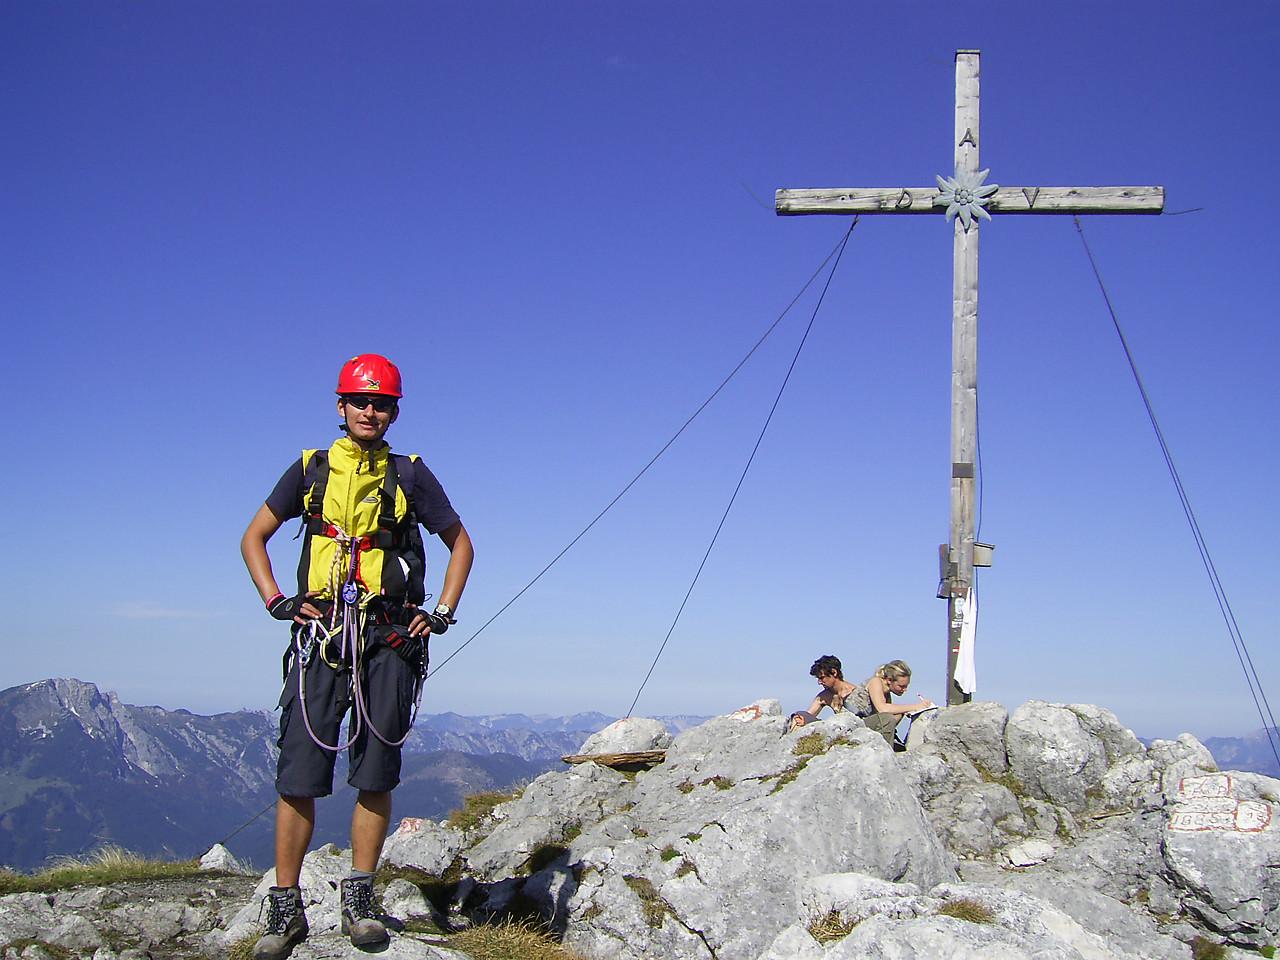 Klettersteig Donnerkogel : Gablonzer hütte intersport klettersteig c d